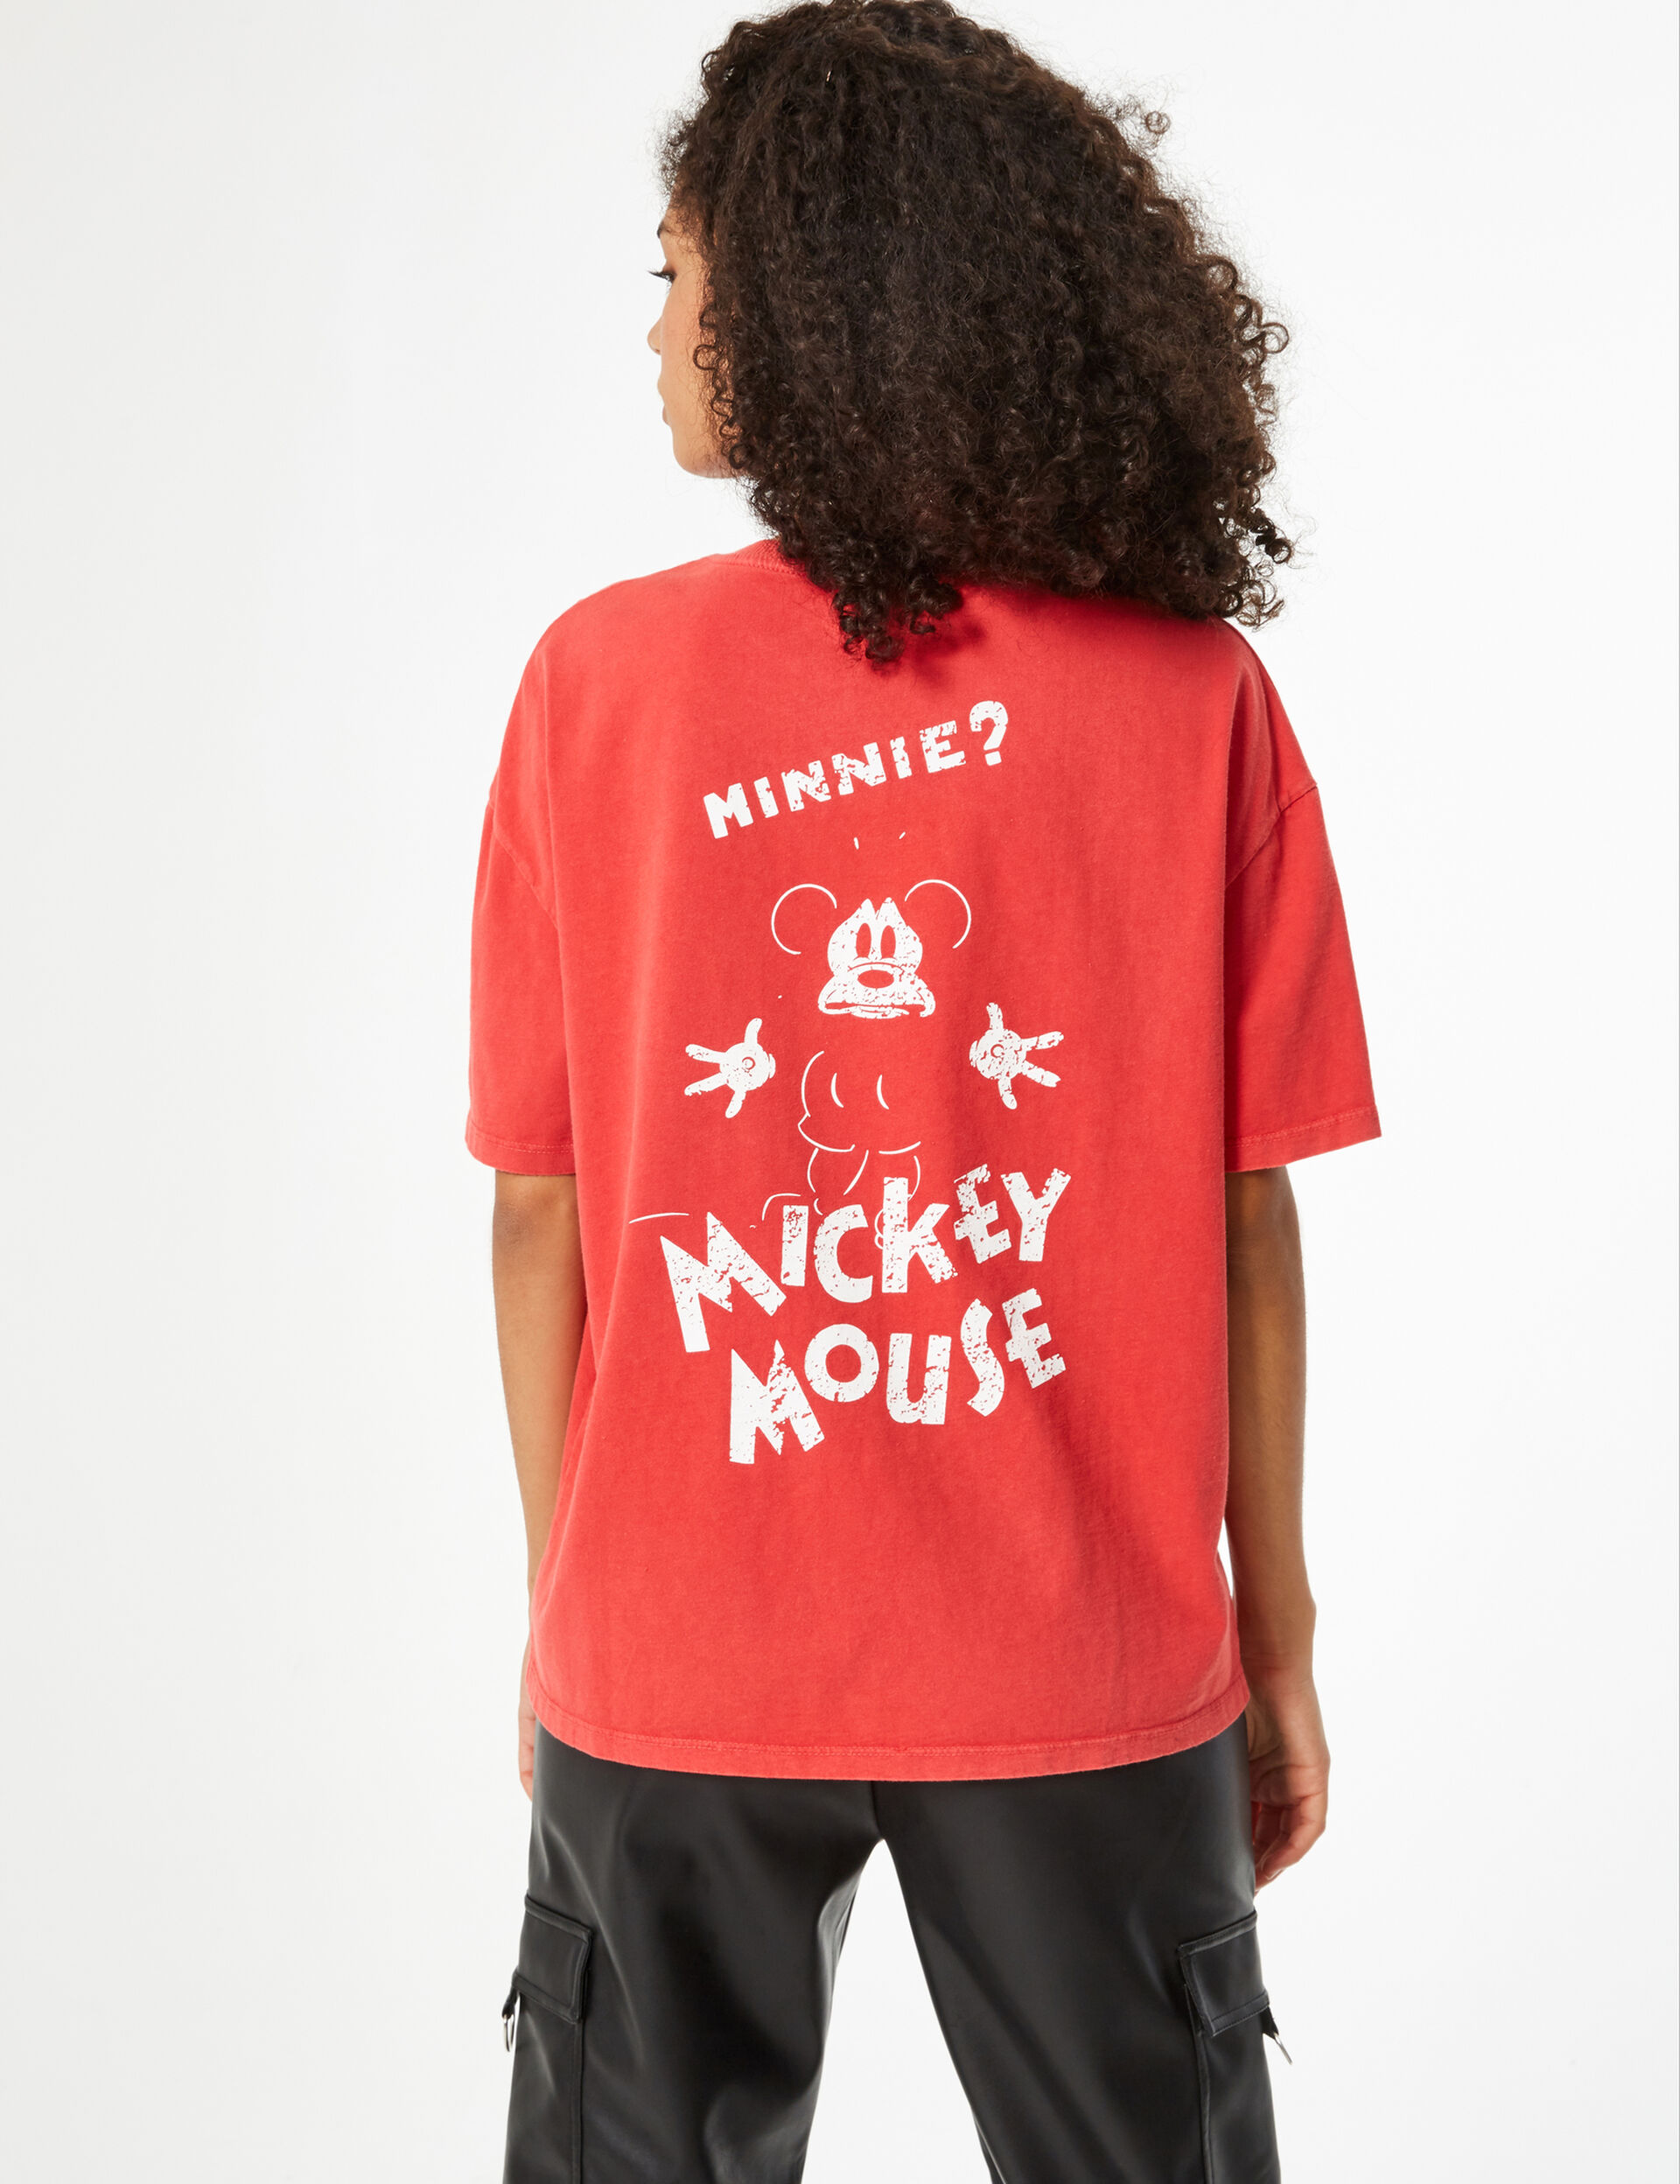 Disney mickey mouse t-shirt